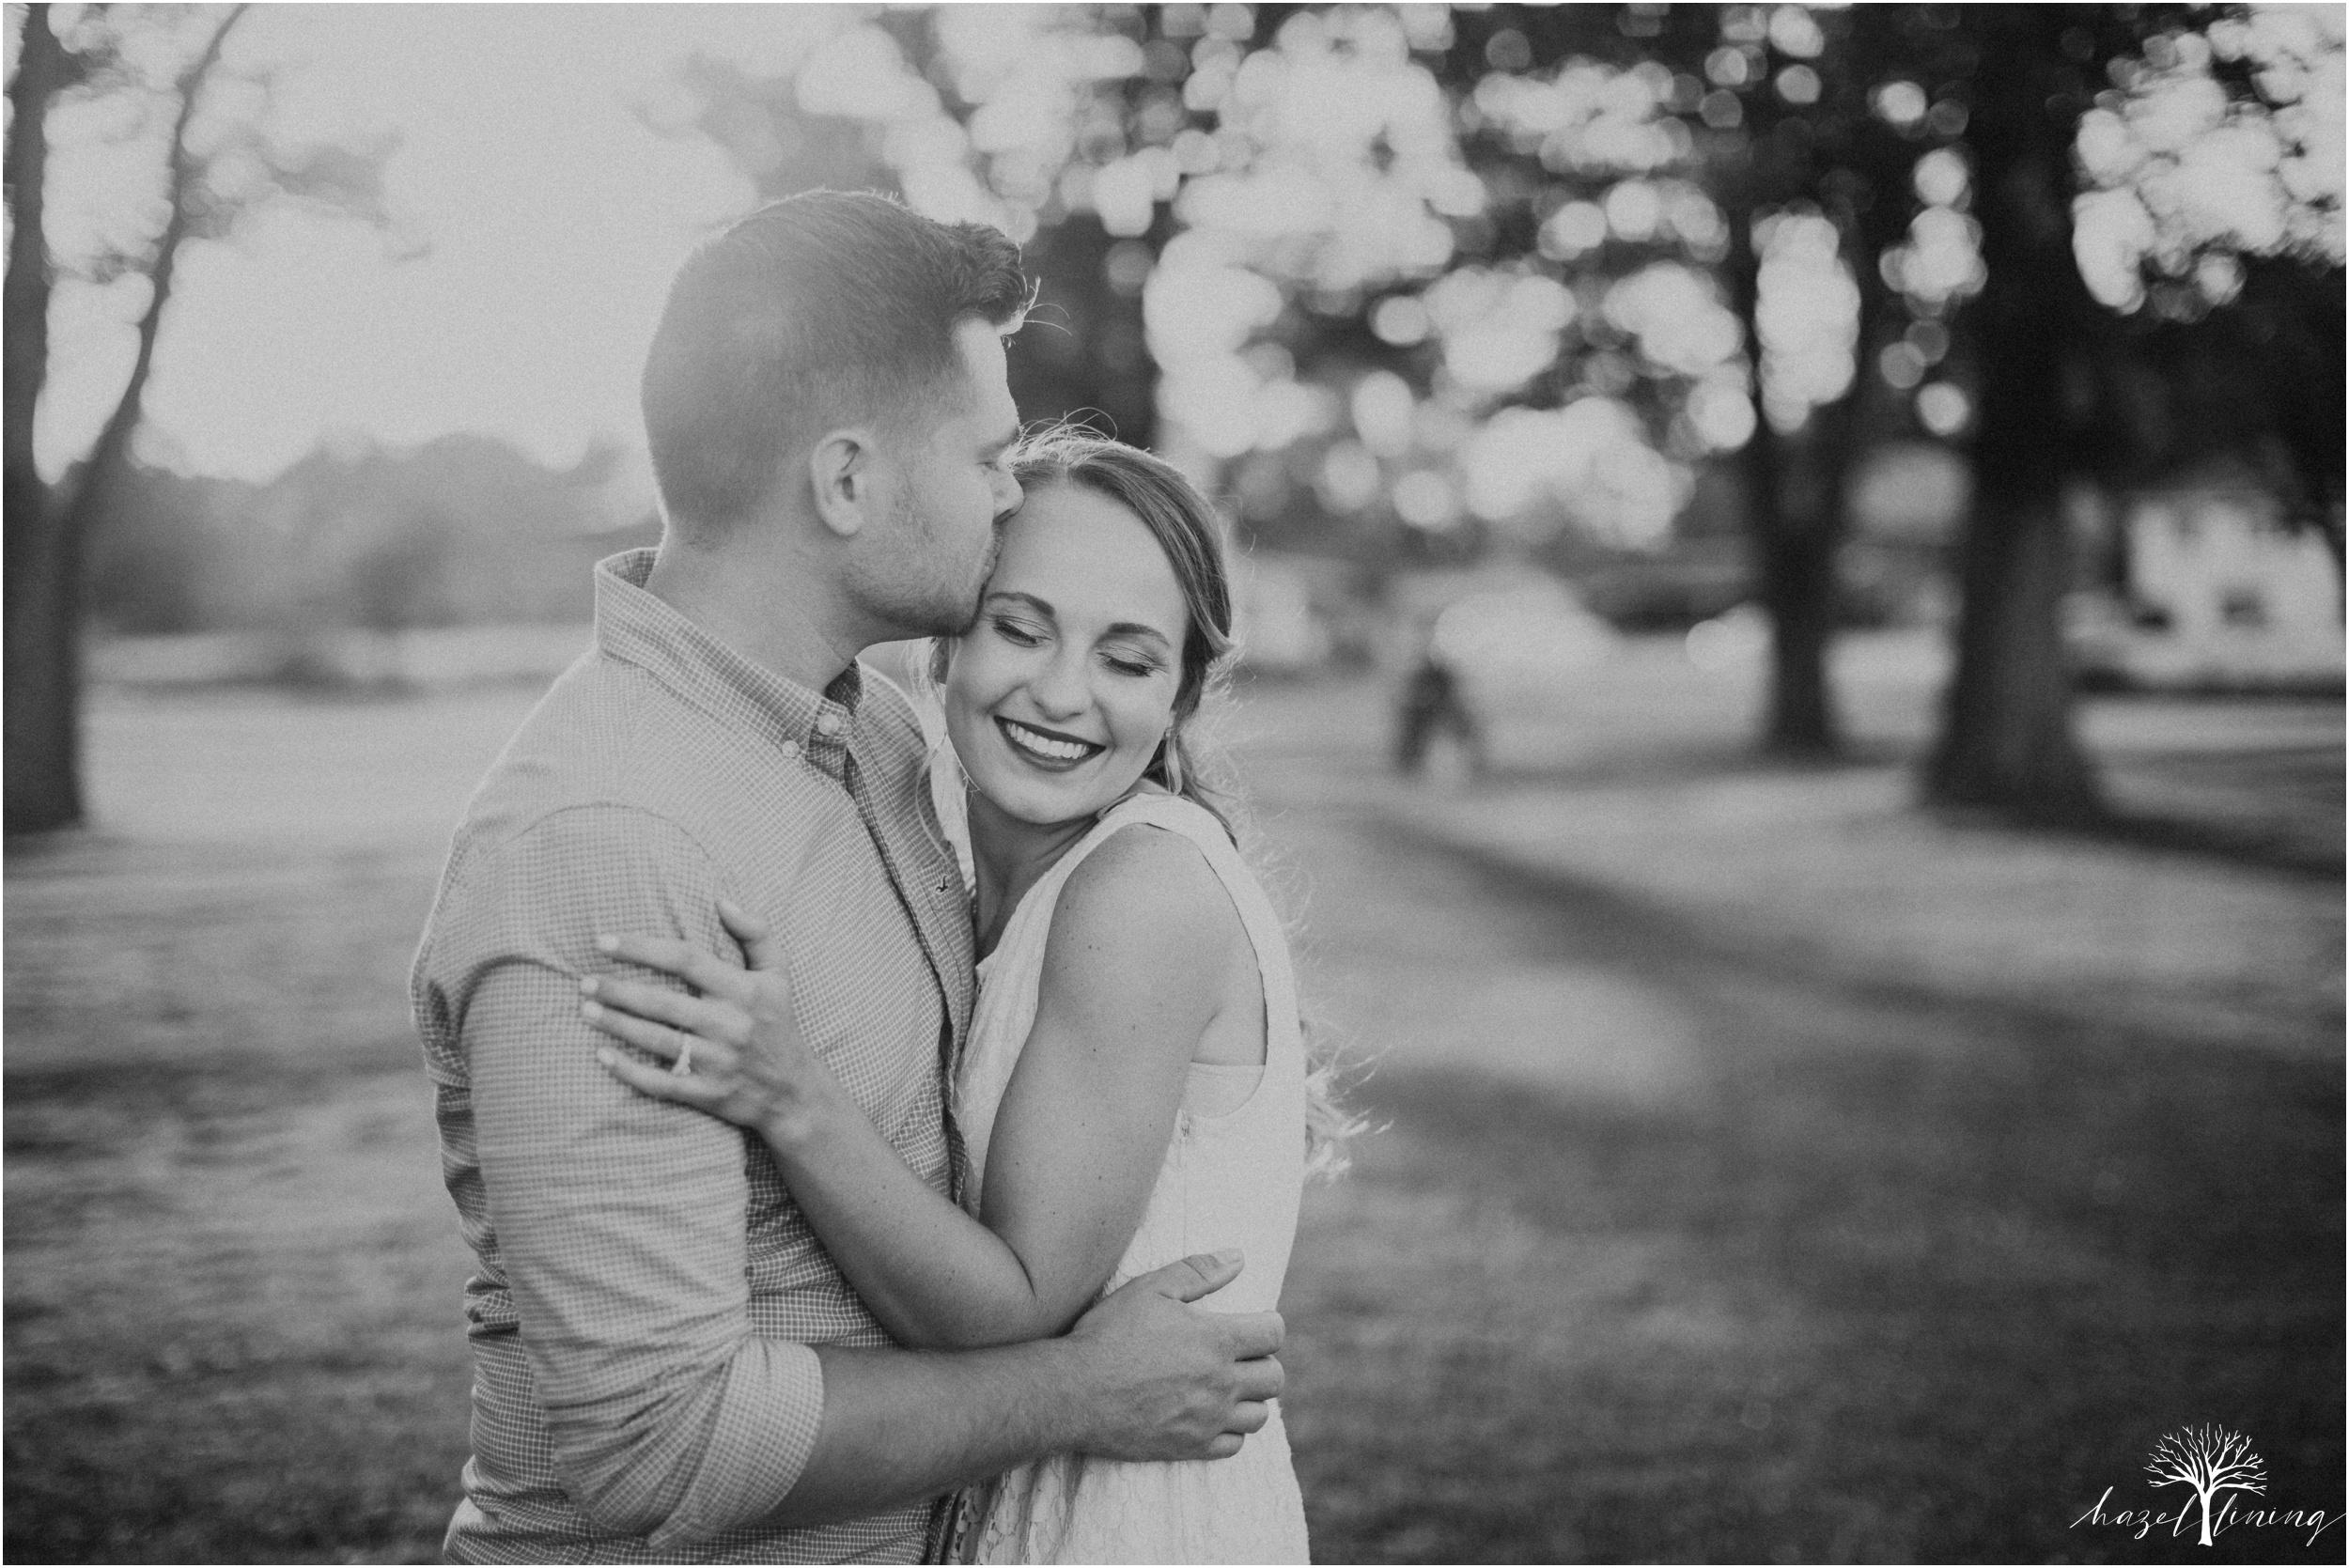 rachel-warner-chris-niedrist-the-farm-bakery-and-events-quakertown-pa-summer-engagement-hazel-lining-photography-destination-elopement-wedding-engagement-photography_0026.jpg